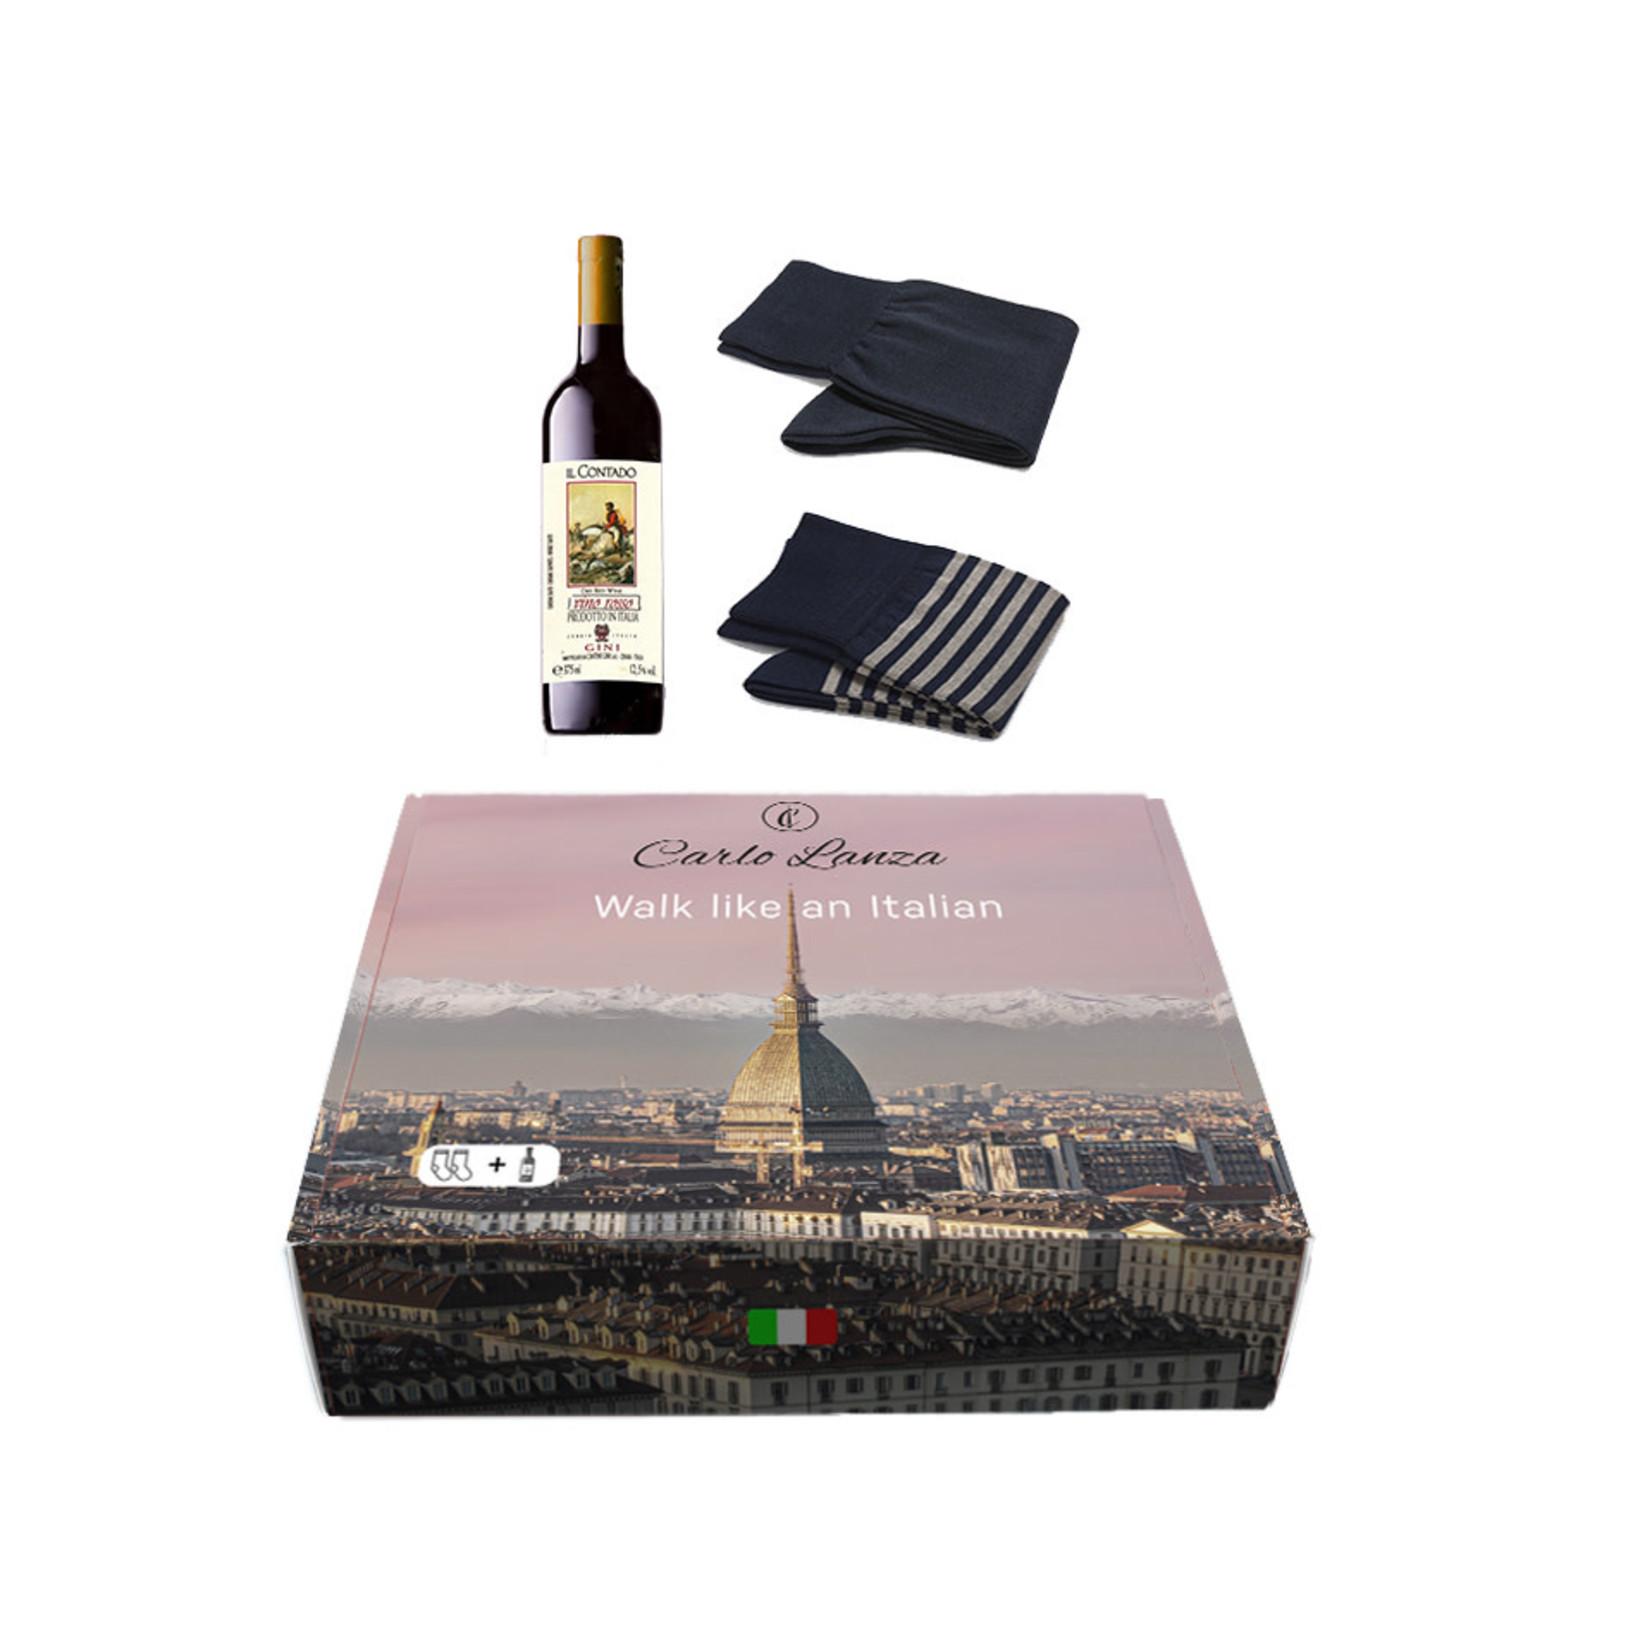 Carlo Lanza cadeaupakket sokken en rode wijn